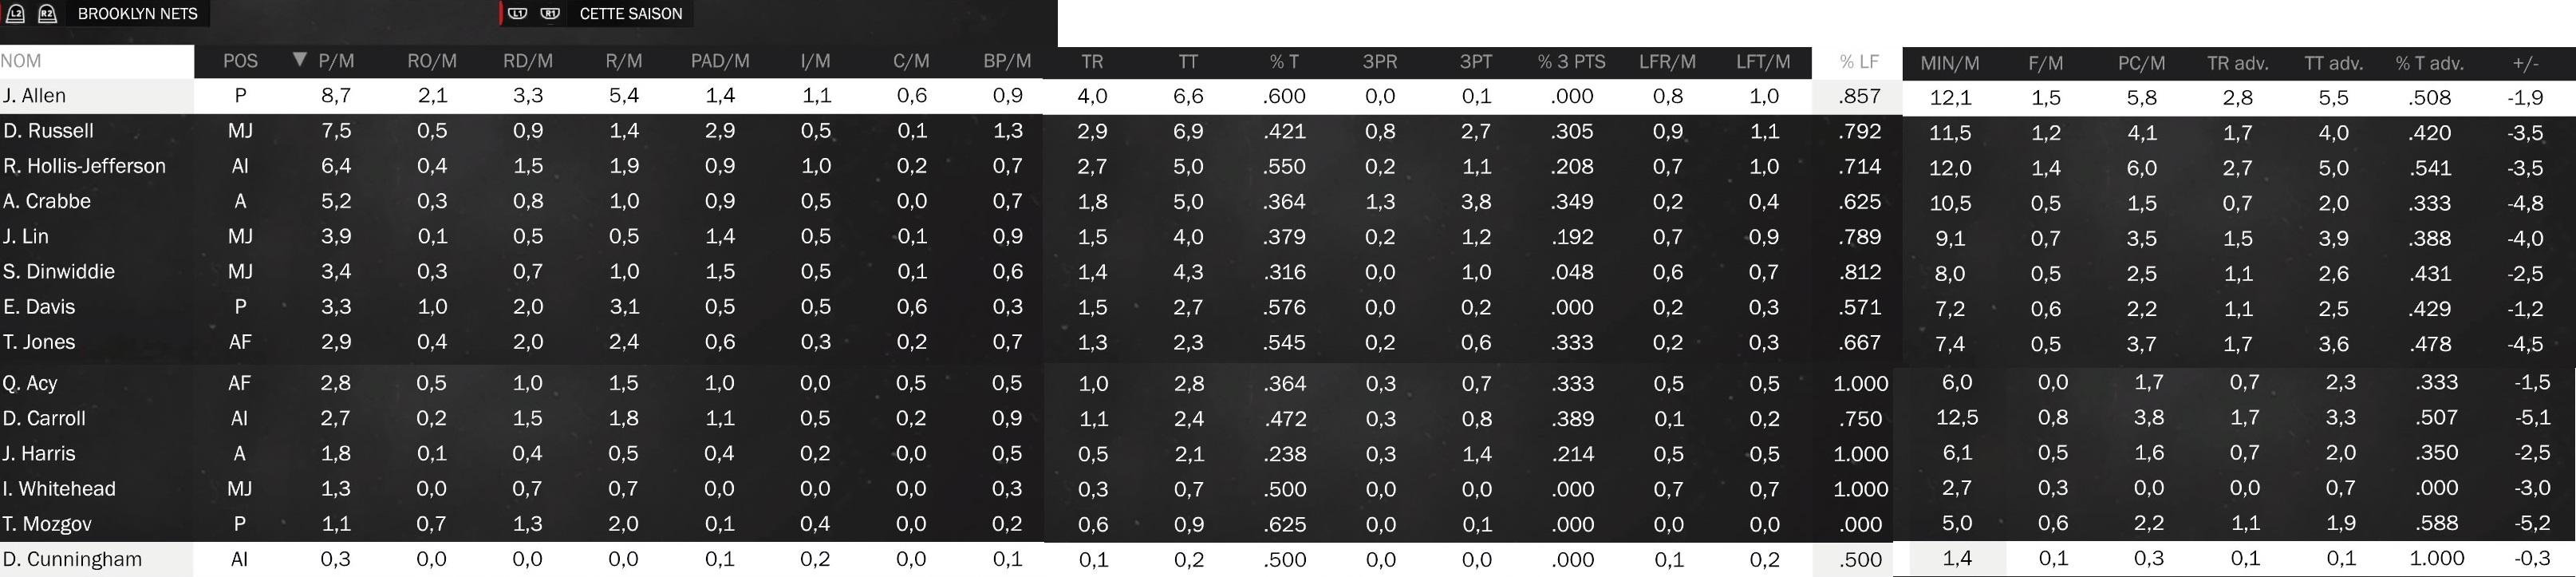 Statistiques individuelles Nets10